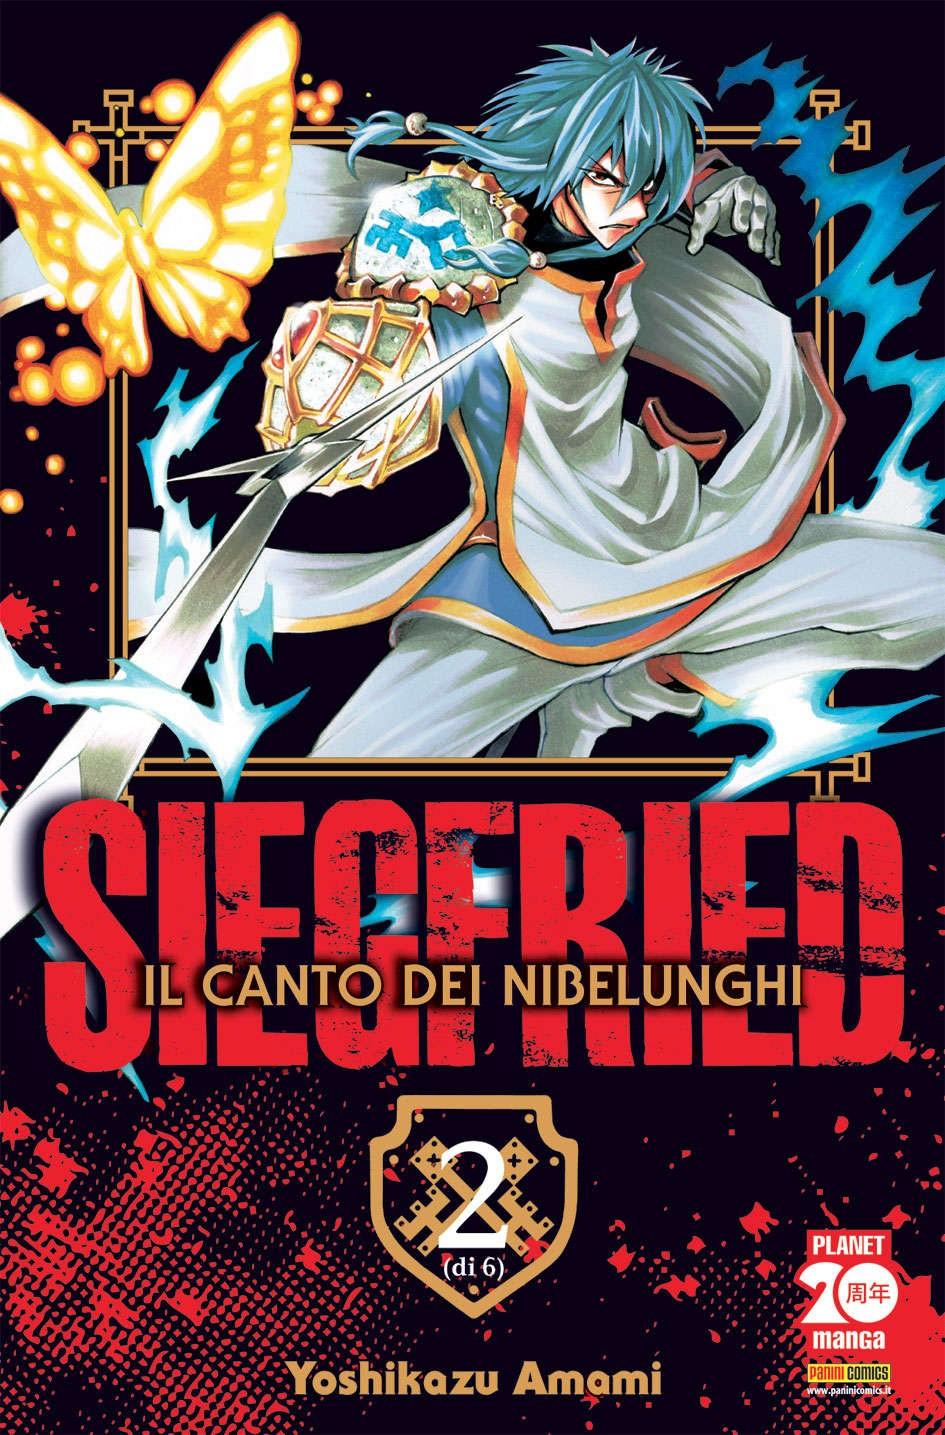 Siegfried - N° 2 - Il Canto Dei Nibelunghi (M6) - Sakura Planet Manga